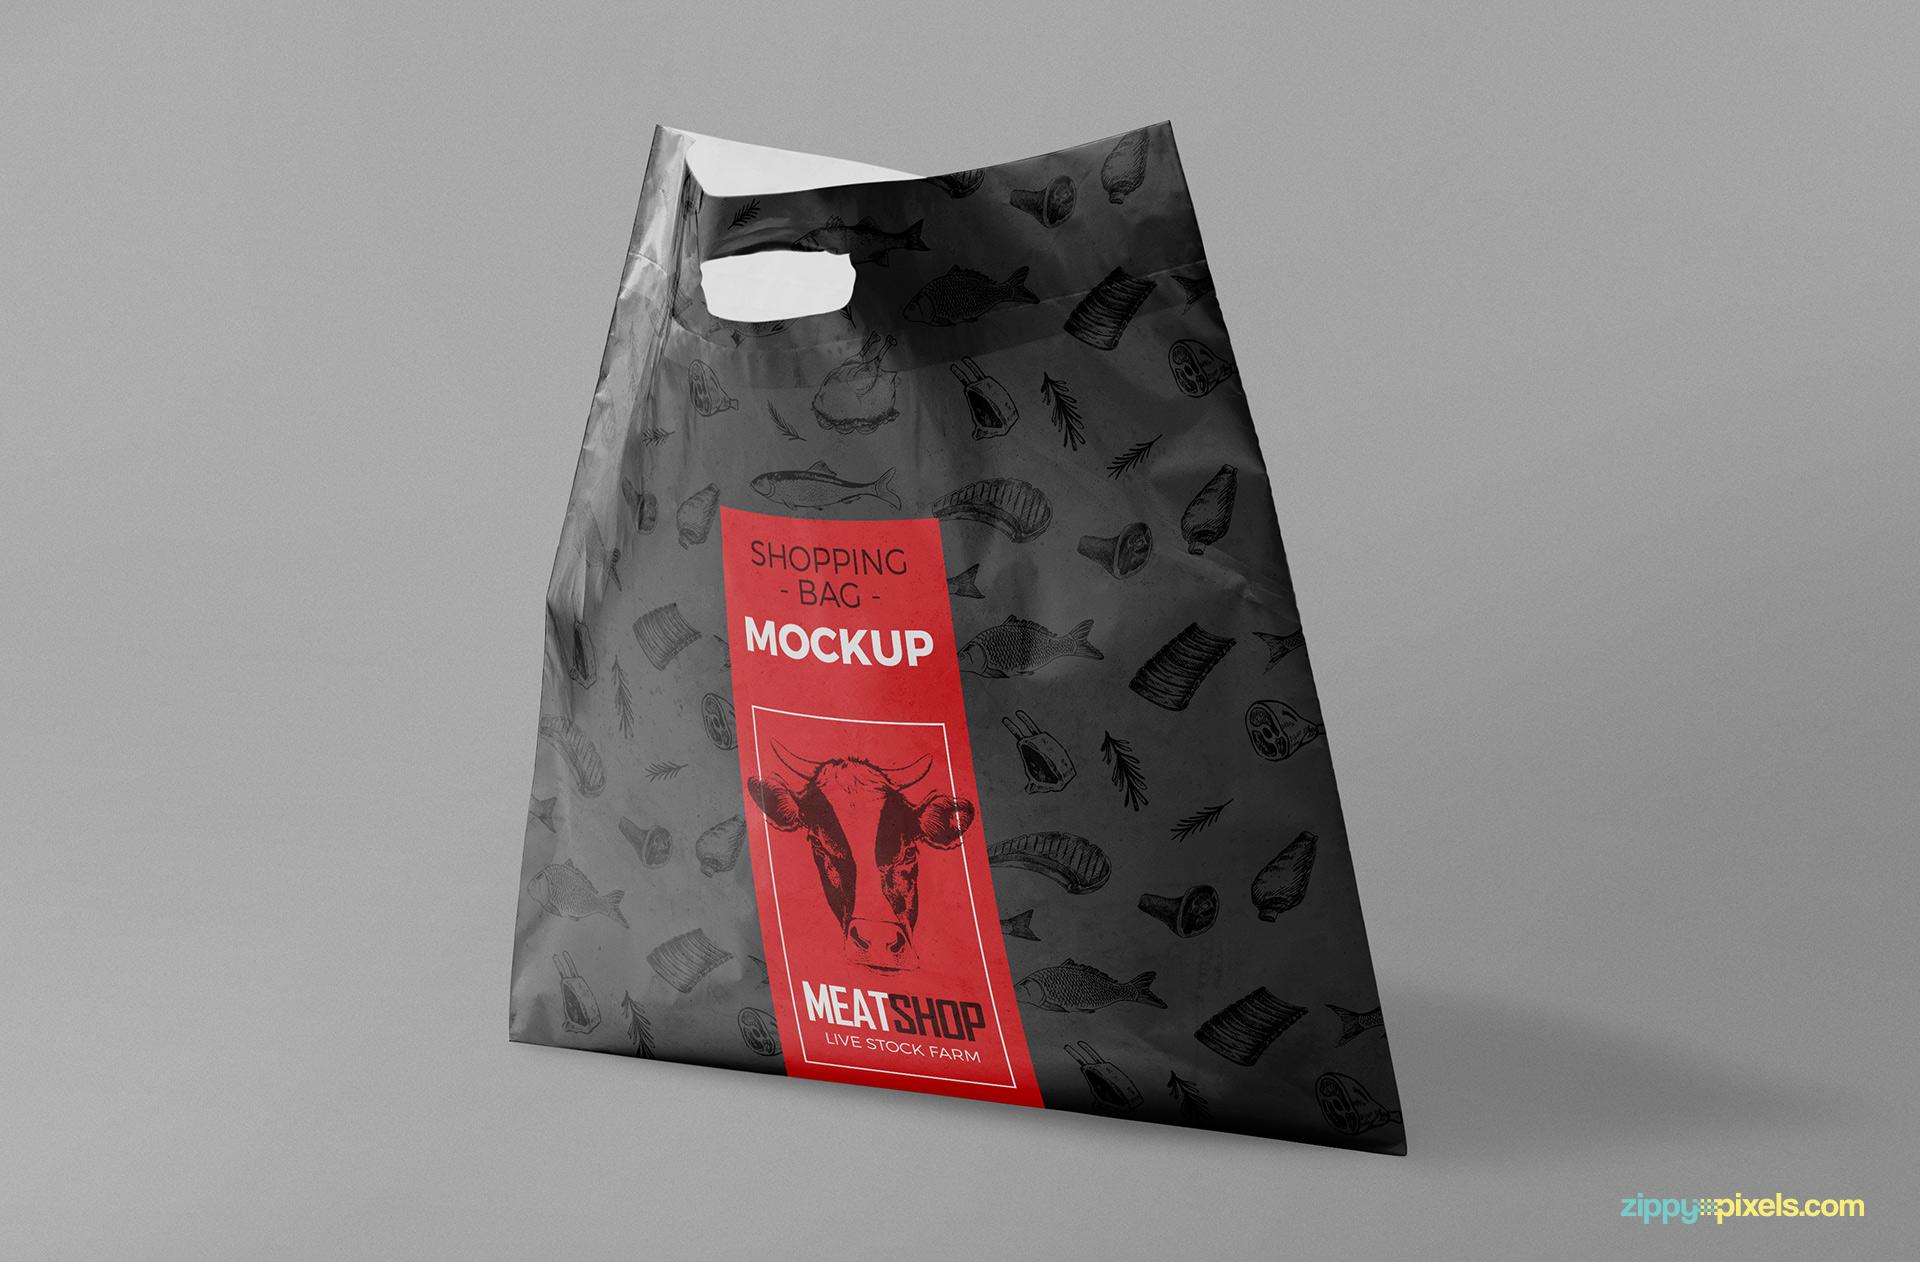 Standing plastic bag mockup free PSD.